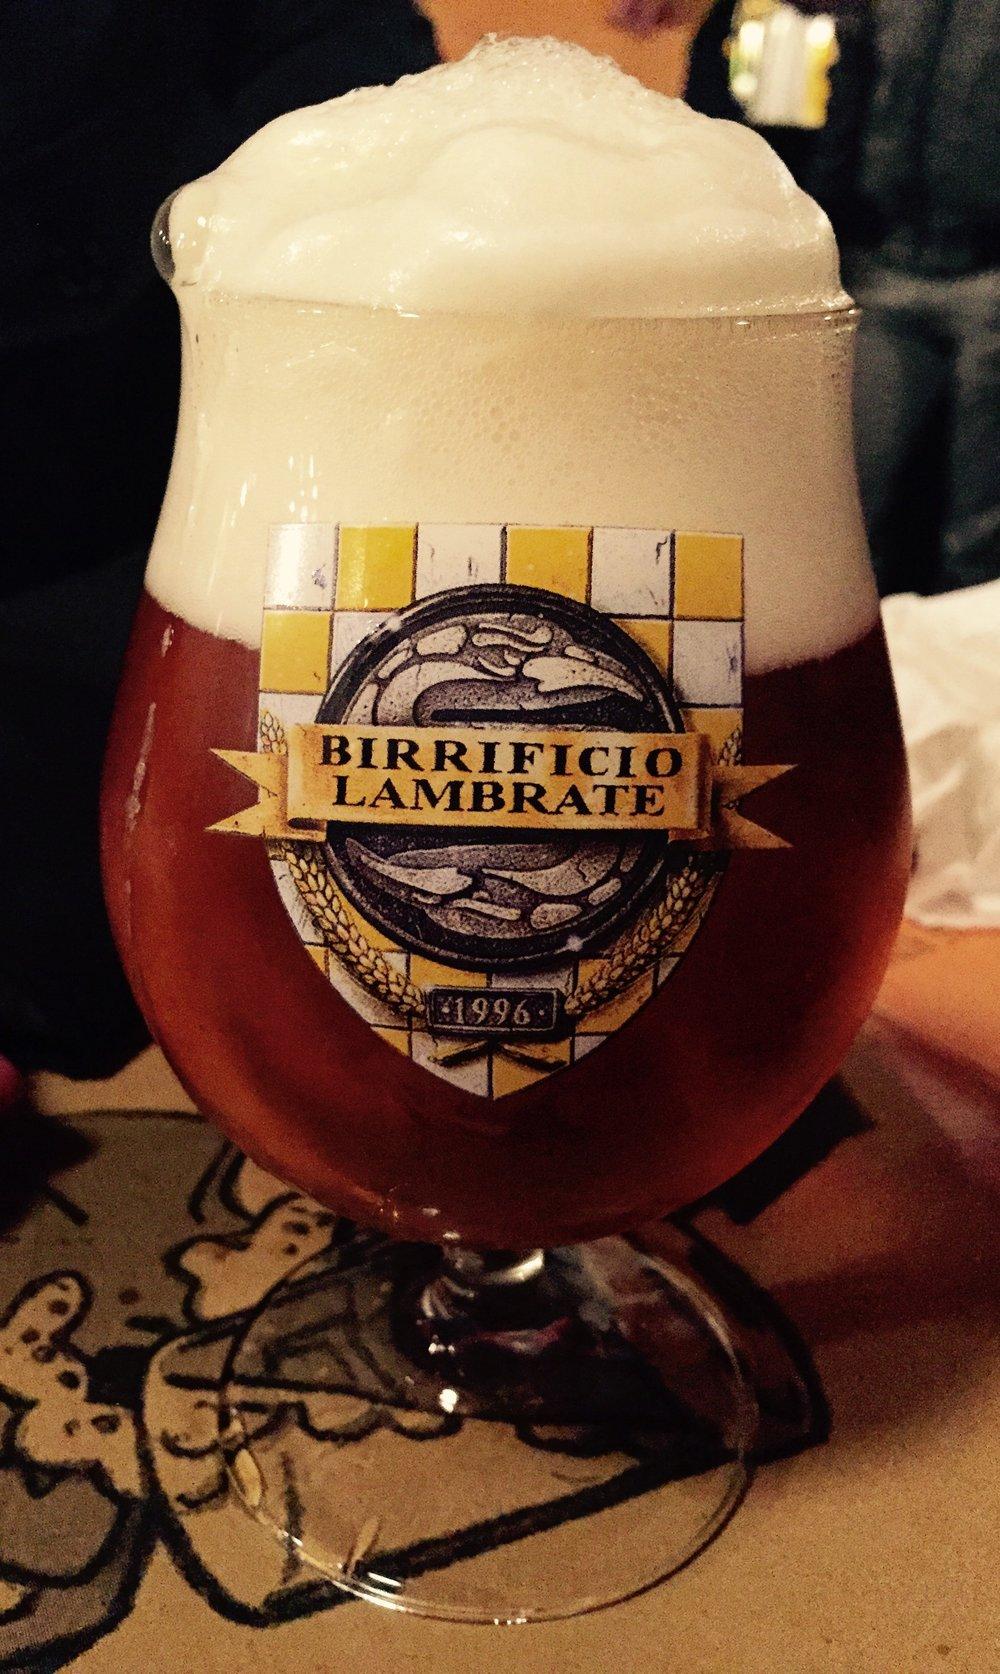 Birrificio Lambrate: Salta-foss, a Belgian style Tripel